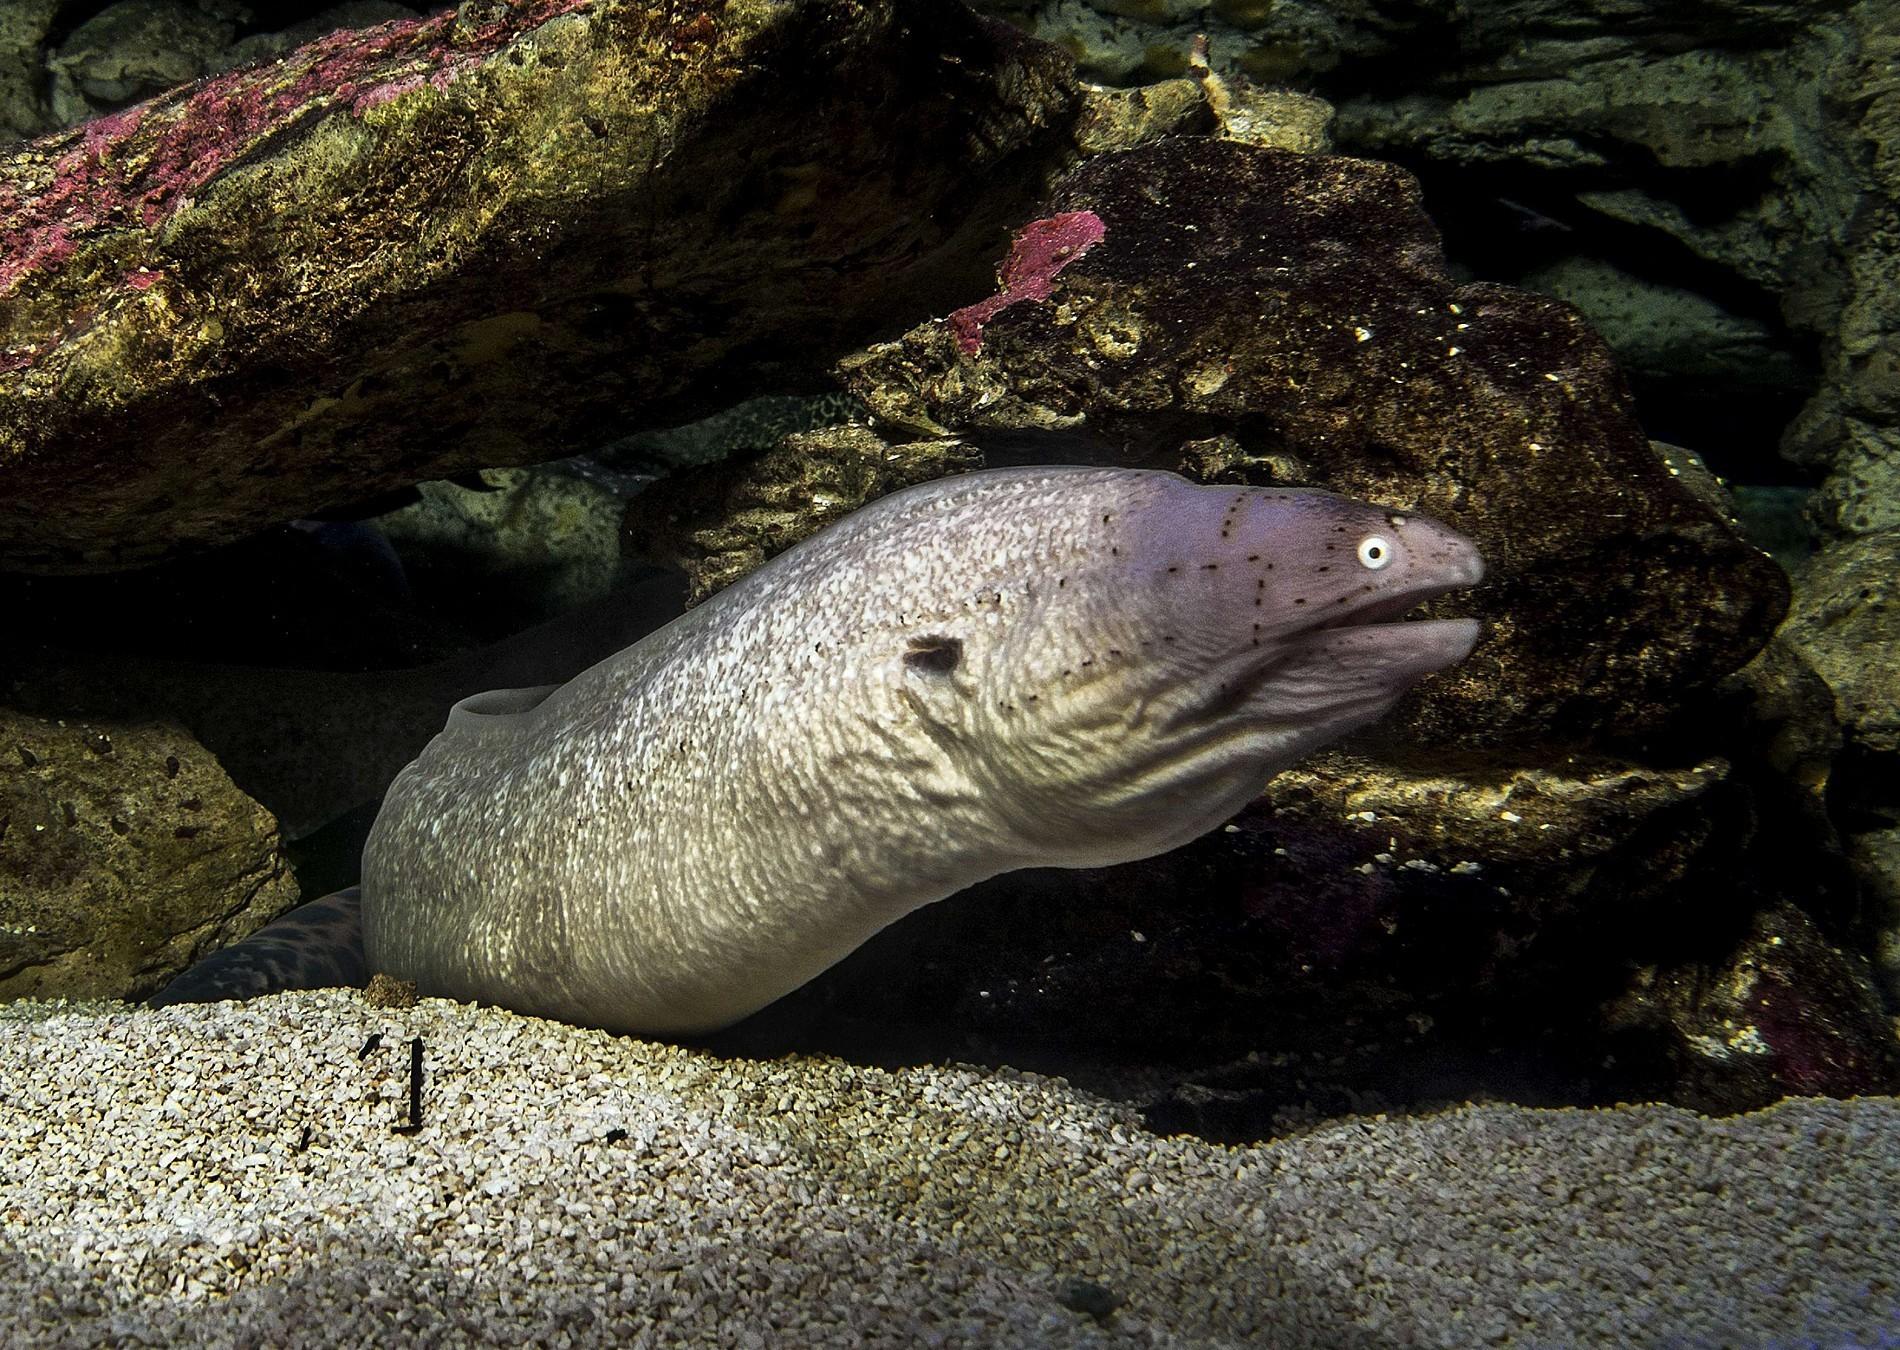 Geometric Moray Eel Species Two Oceans Aquarium Cape